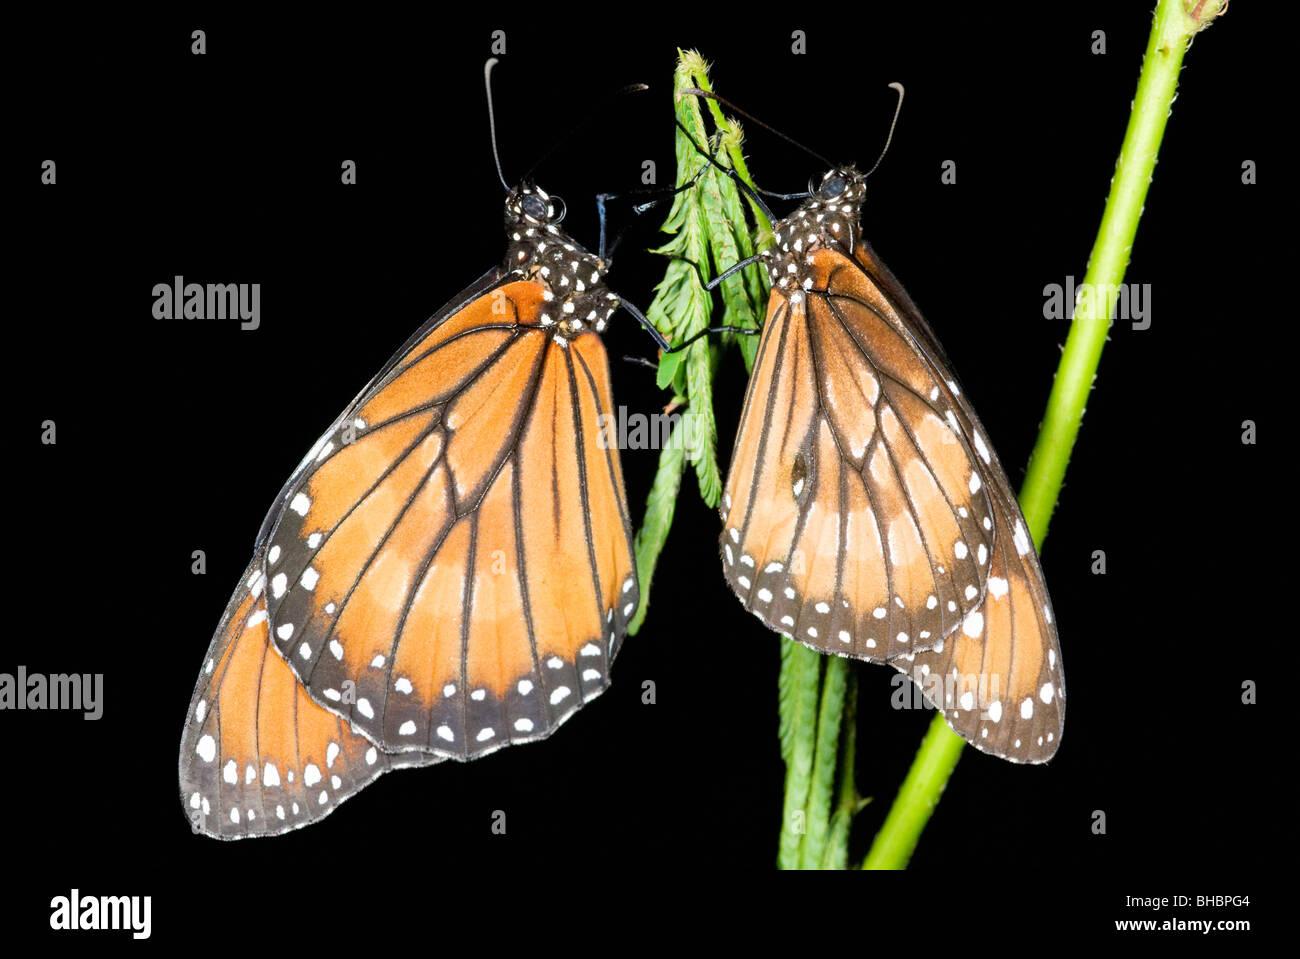 Monarch Butterflies (Danaus plexippus) Resting at night, Calakmul Biosphere Reserve, MEXICO - Stock Image